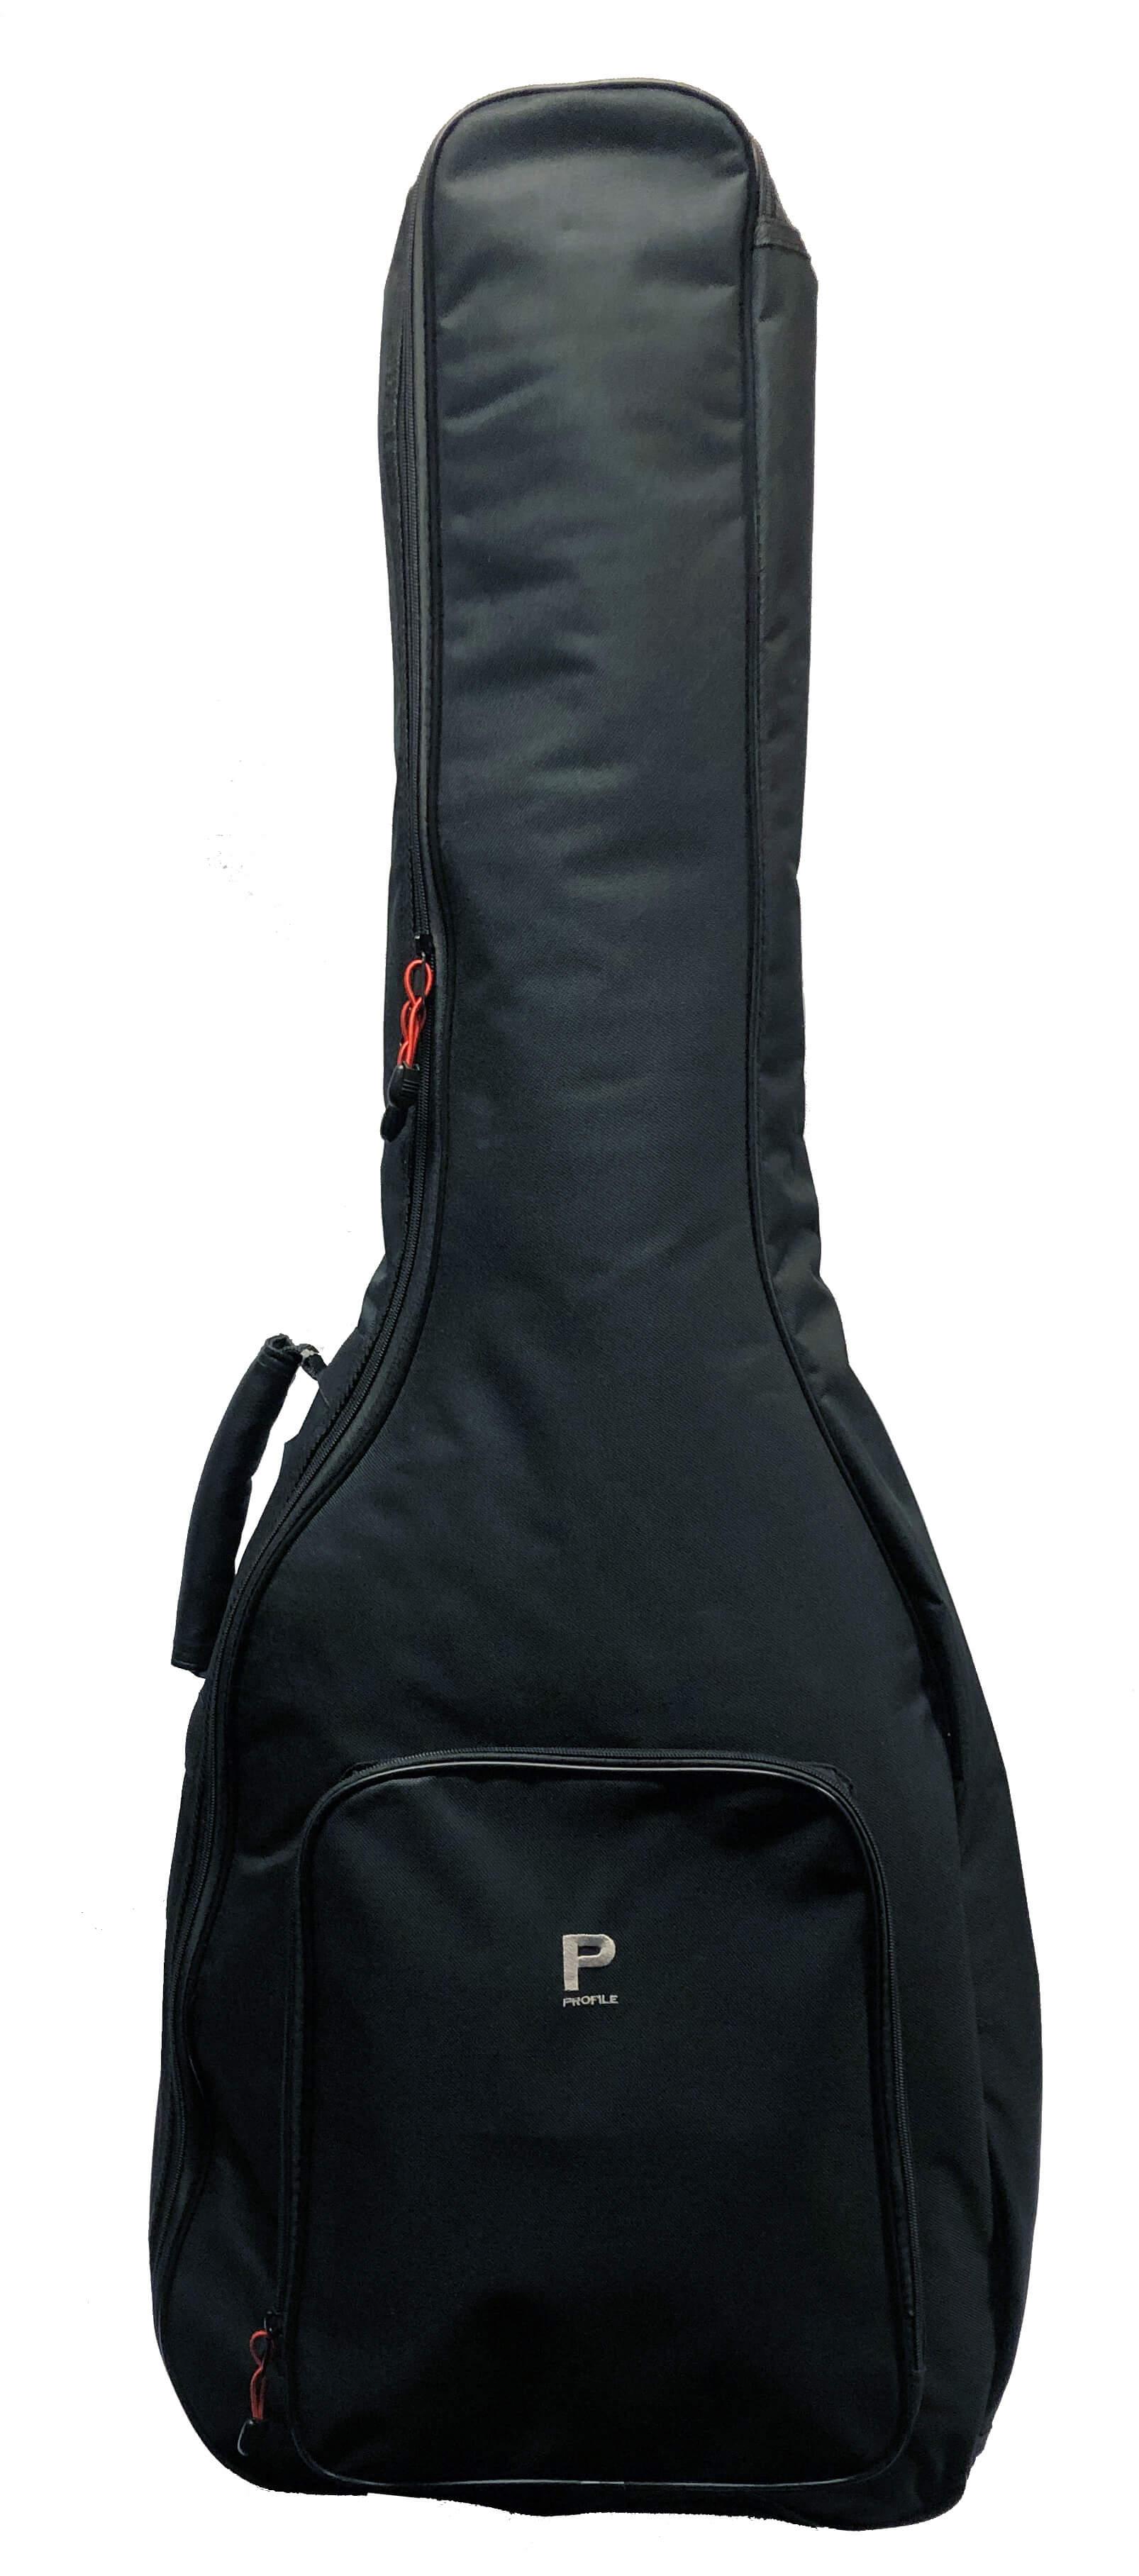 Profile PR50-DB Gig-Bag Dreadnought Acoustic Guitar